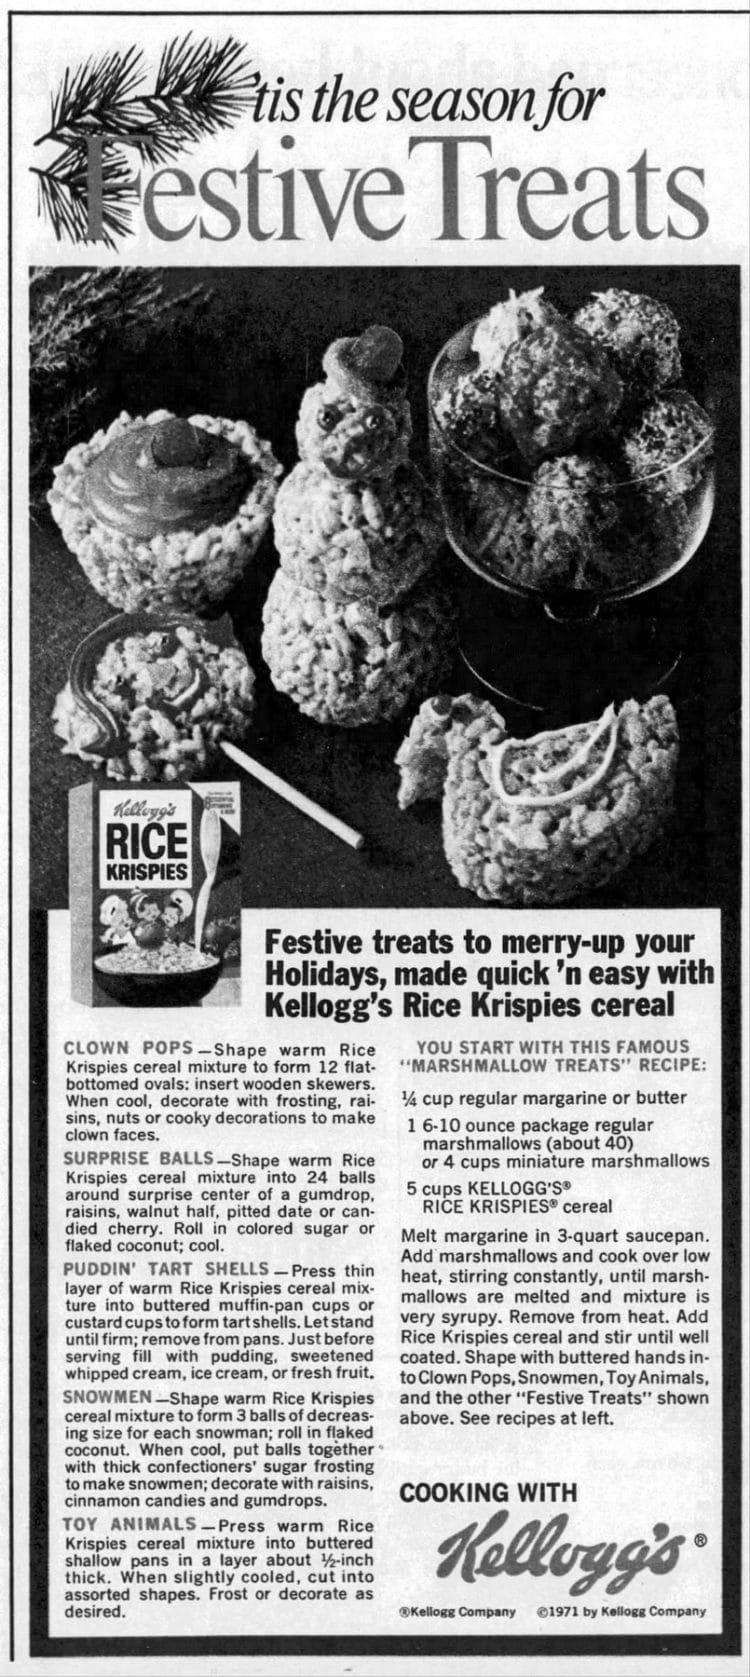 Christmas 'tis the season for Merry Rice Krispies Treats 1973